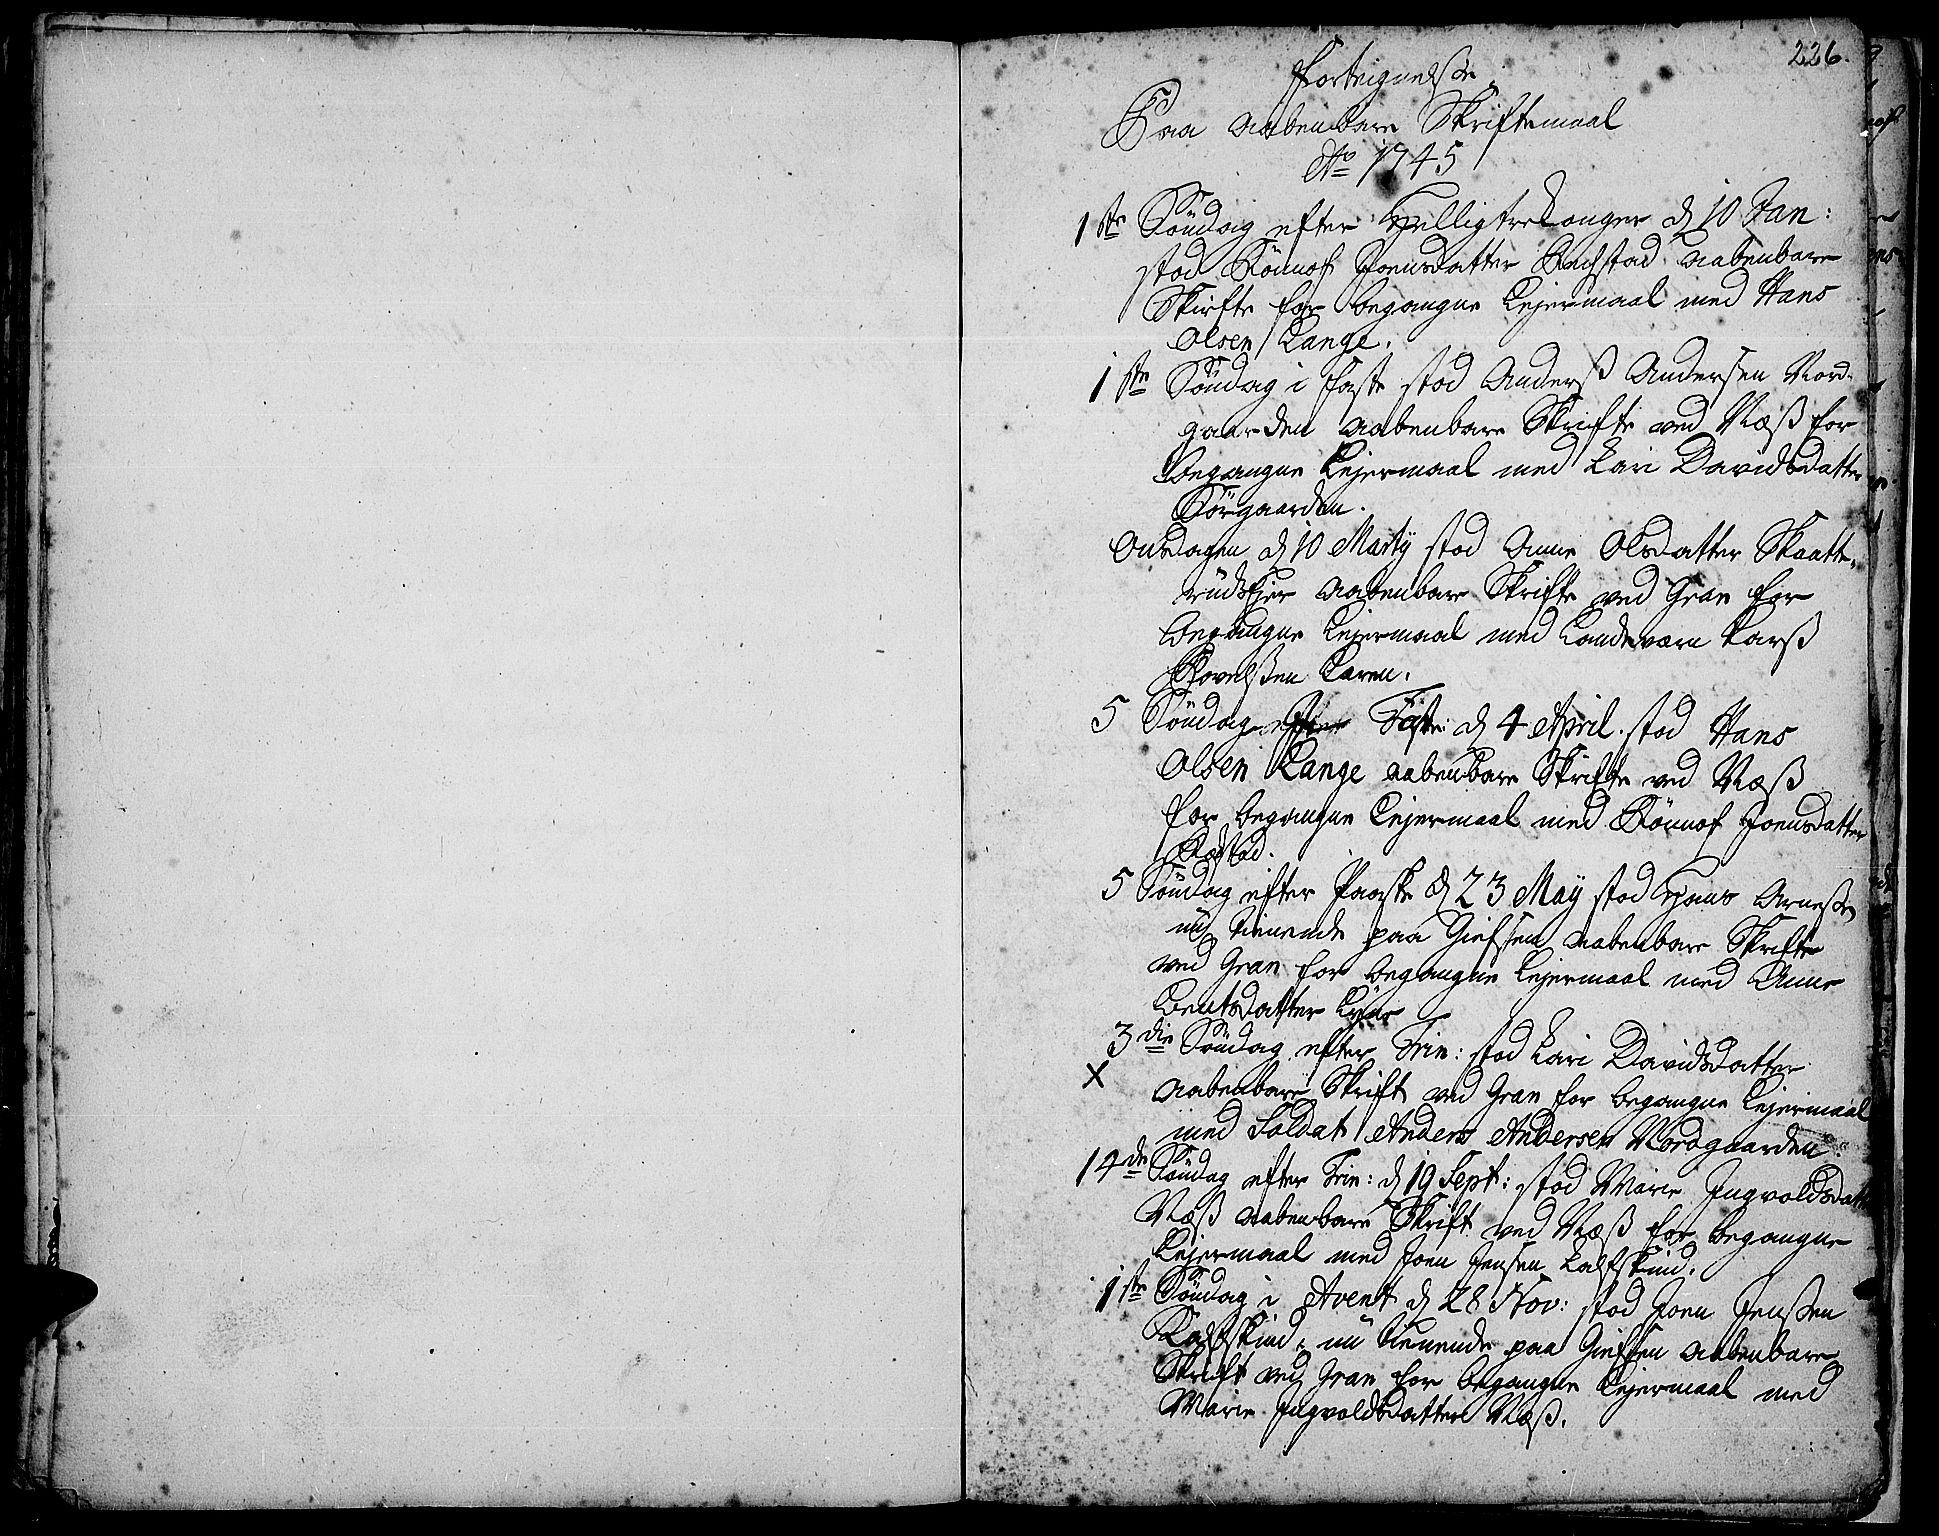 SAH, Gran prestekontor, Ministerialbok nr. 3, 1745-1758, s. 226